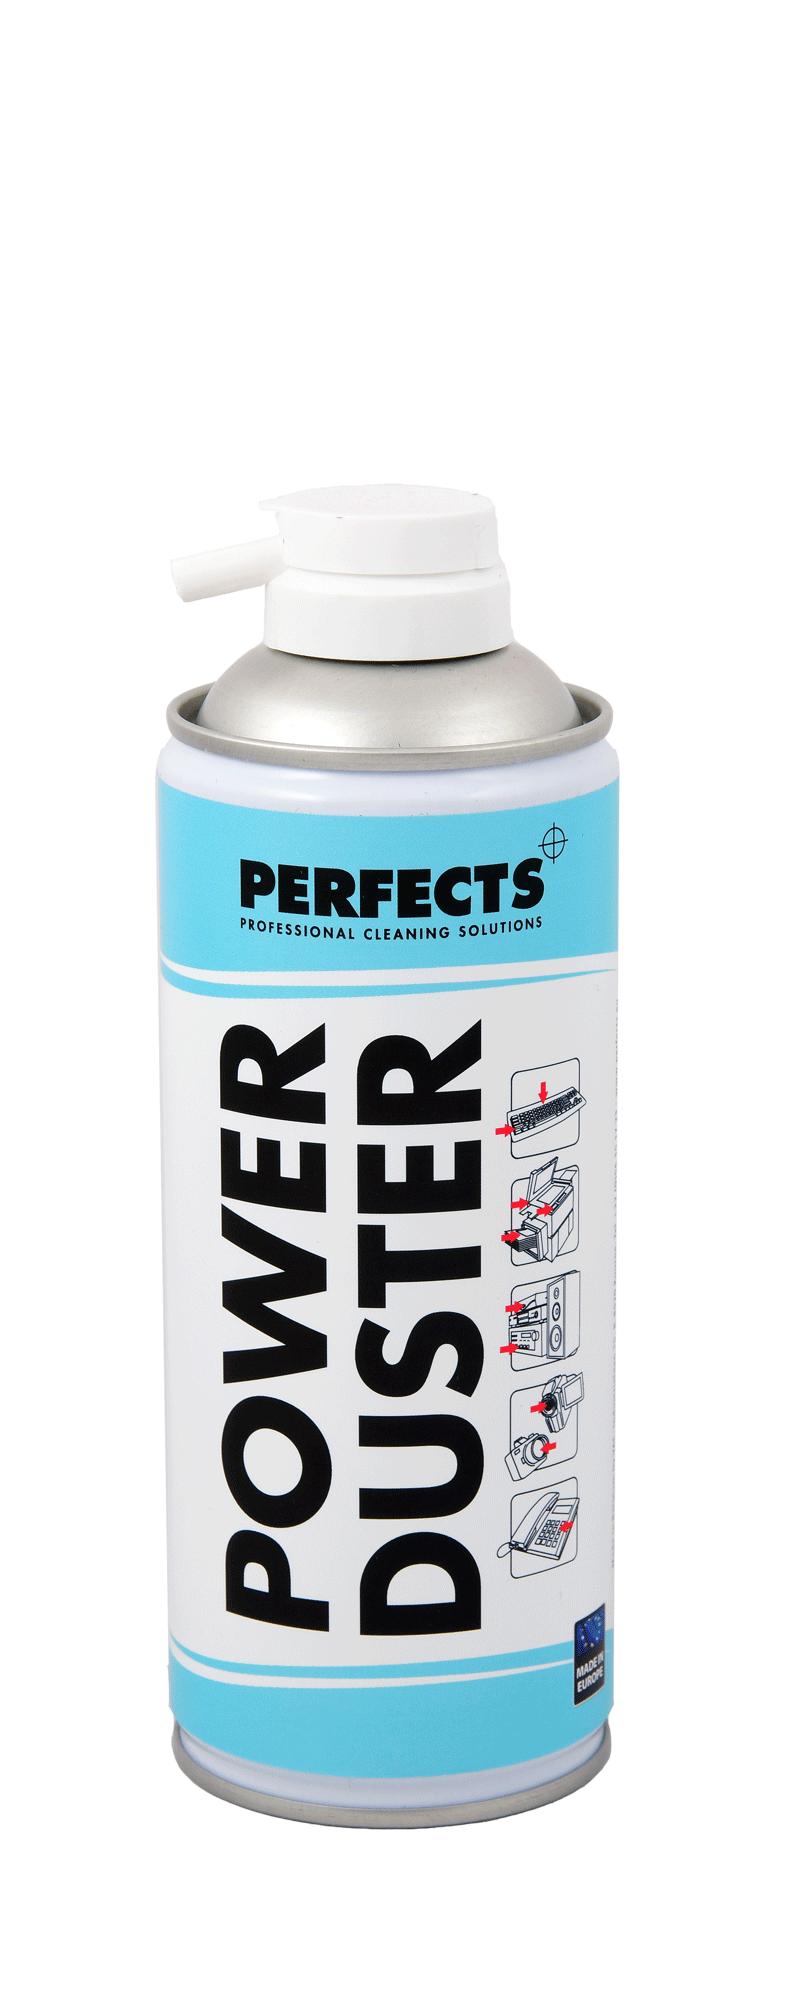 Power Duster Spray Non-Flammable